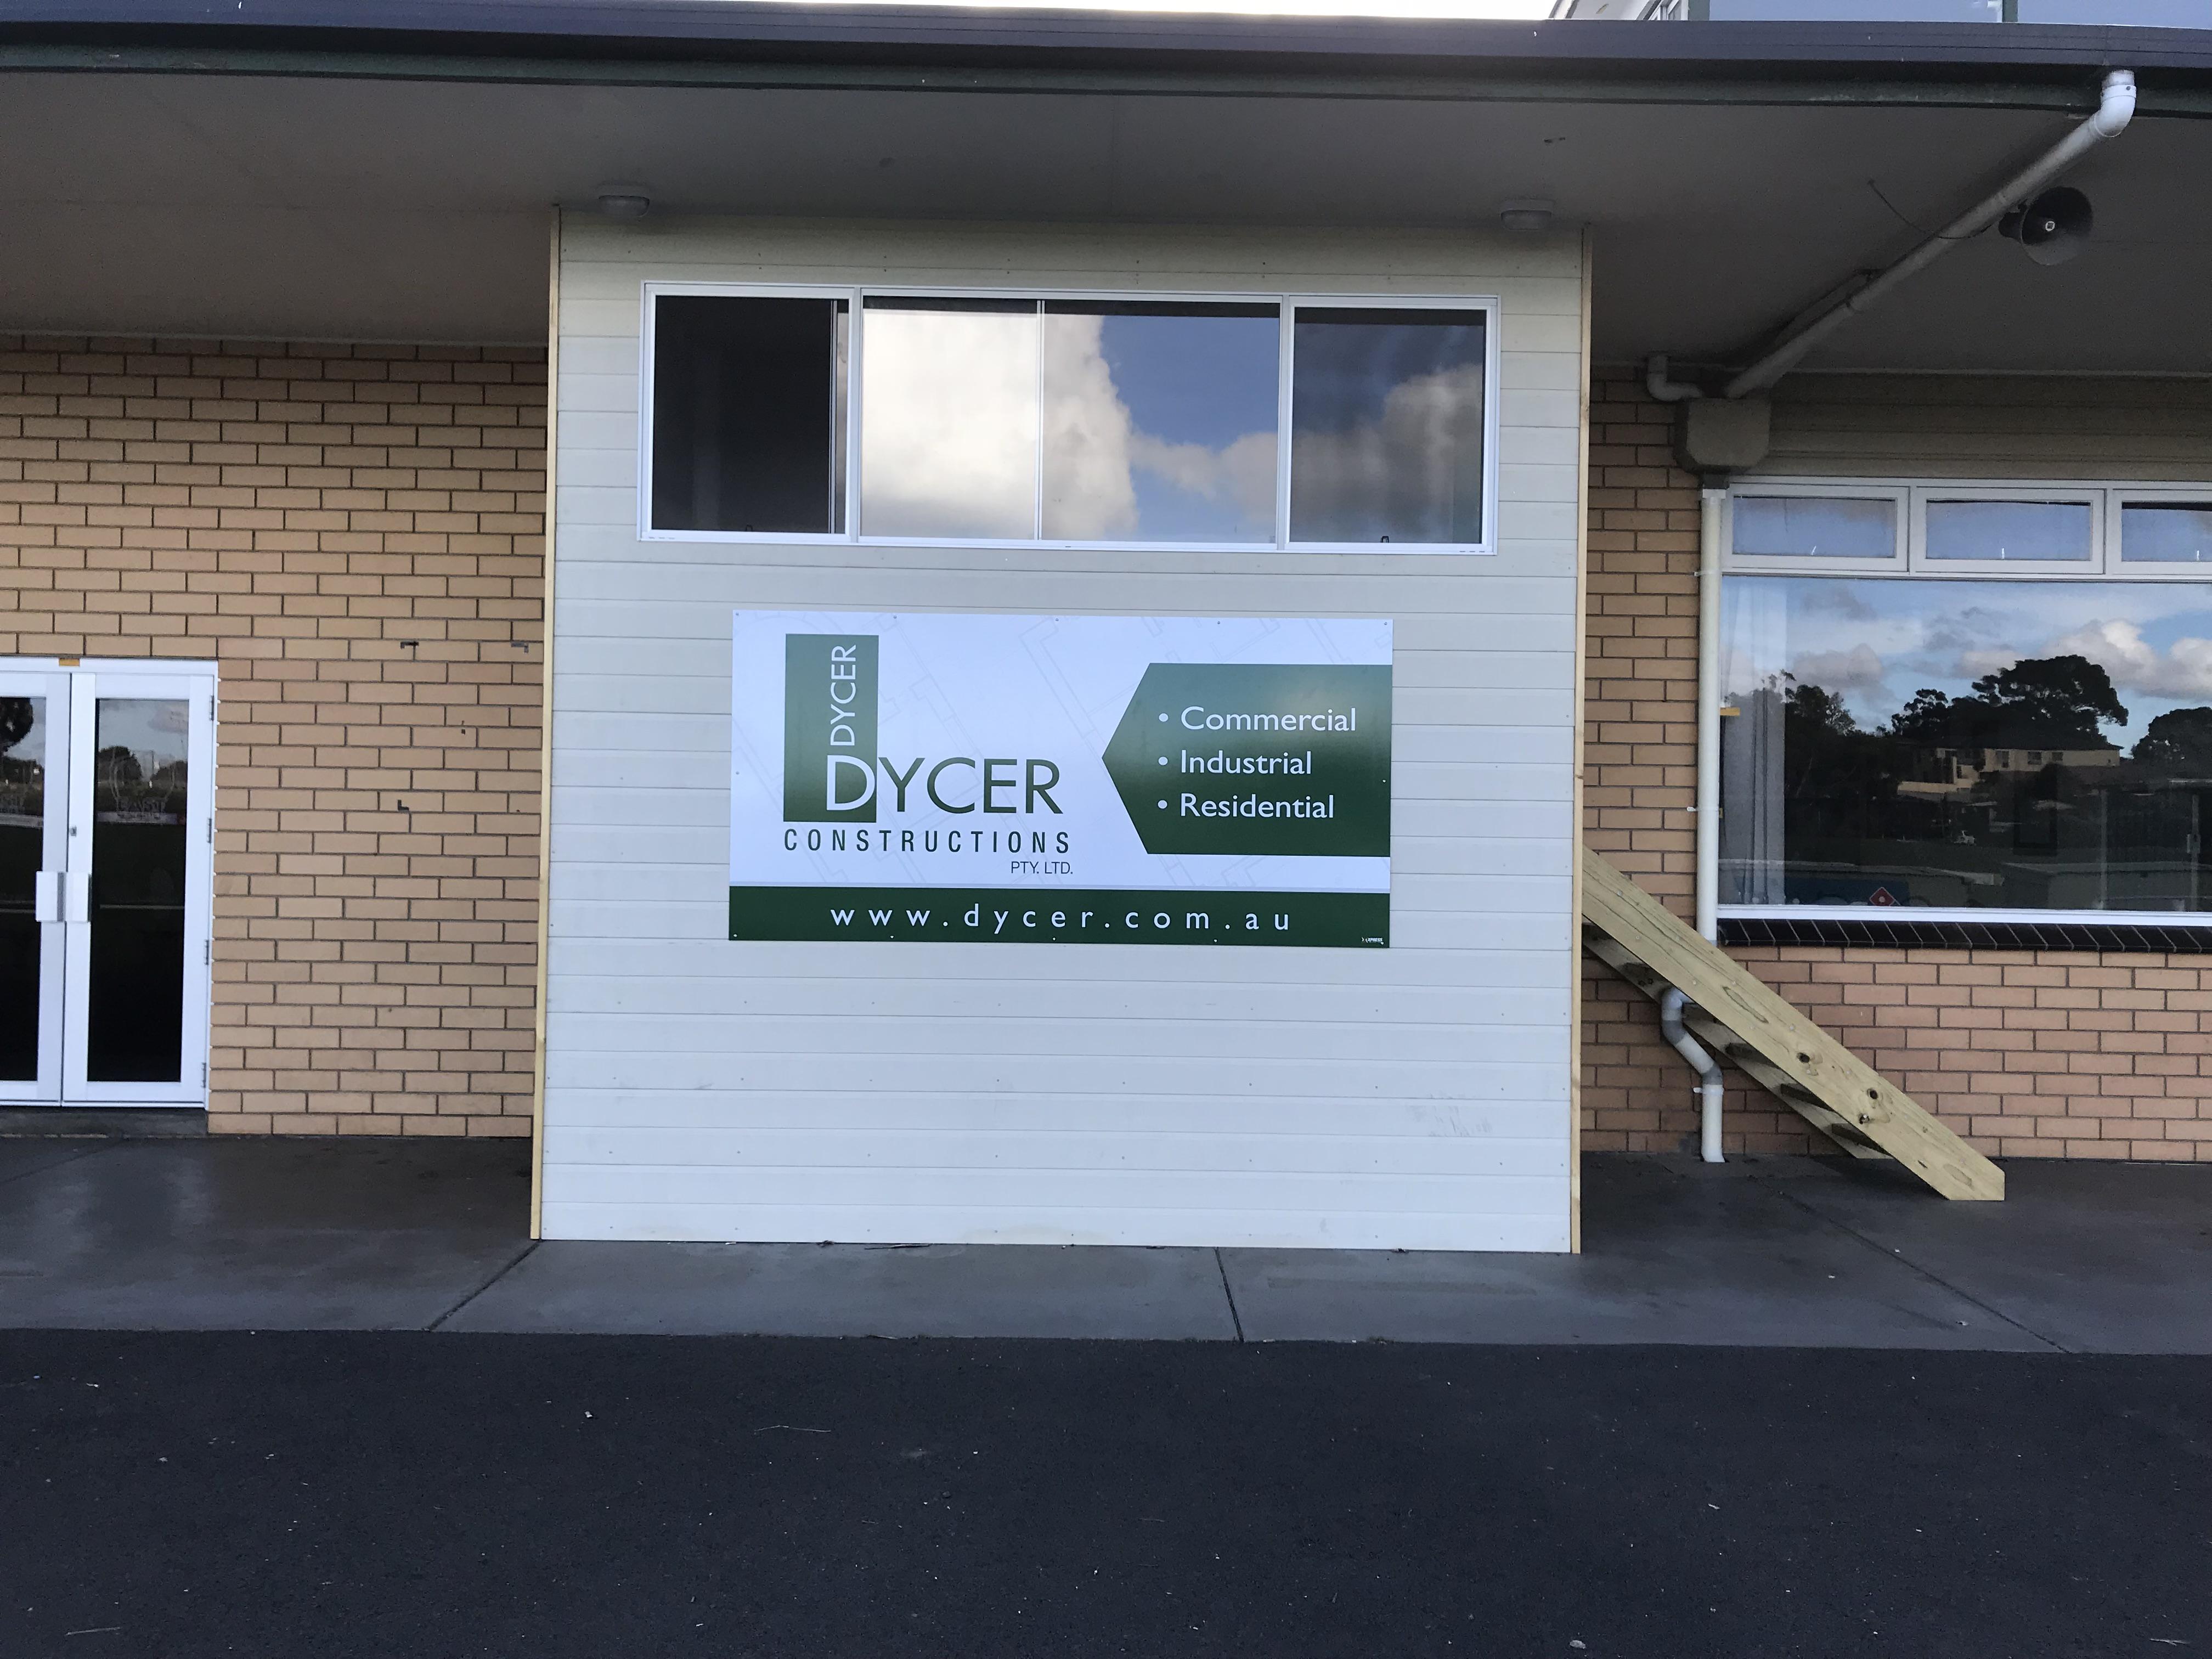 Dycer Constructions Sponsor Sign